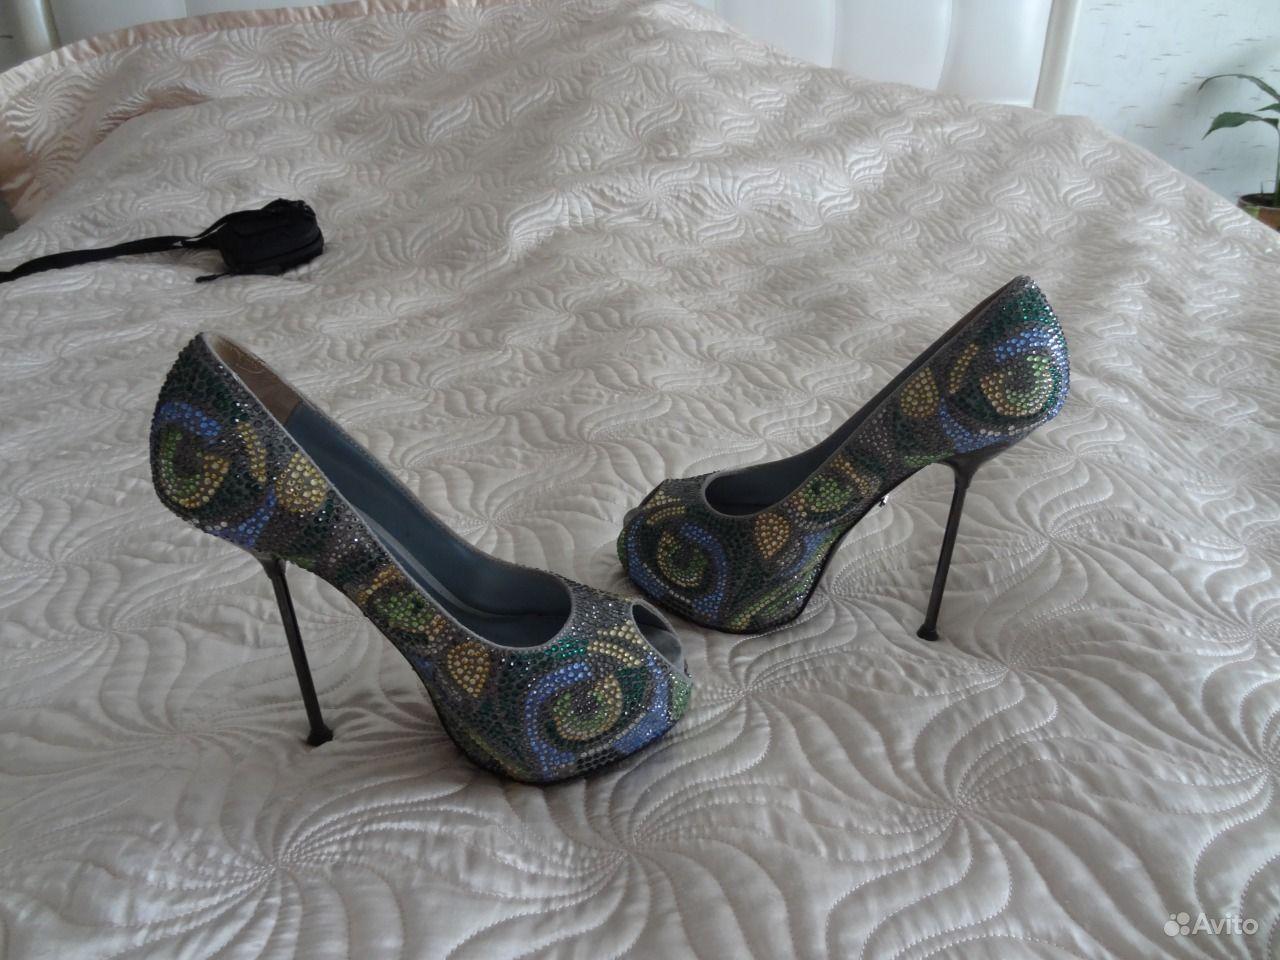 b331f9c1f Магазин первый немецкий телемагазин шоппинг лайф обувь